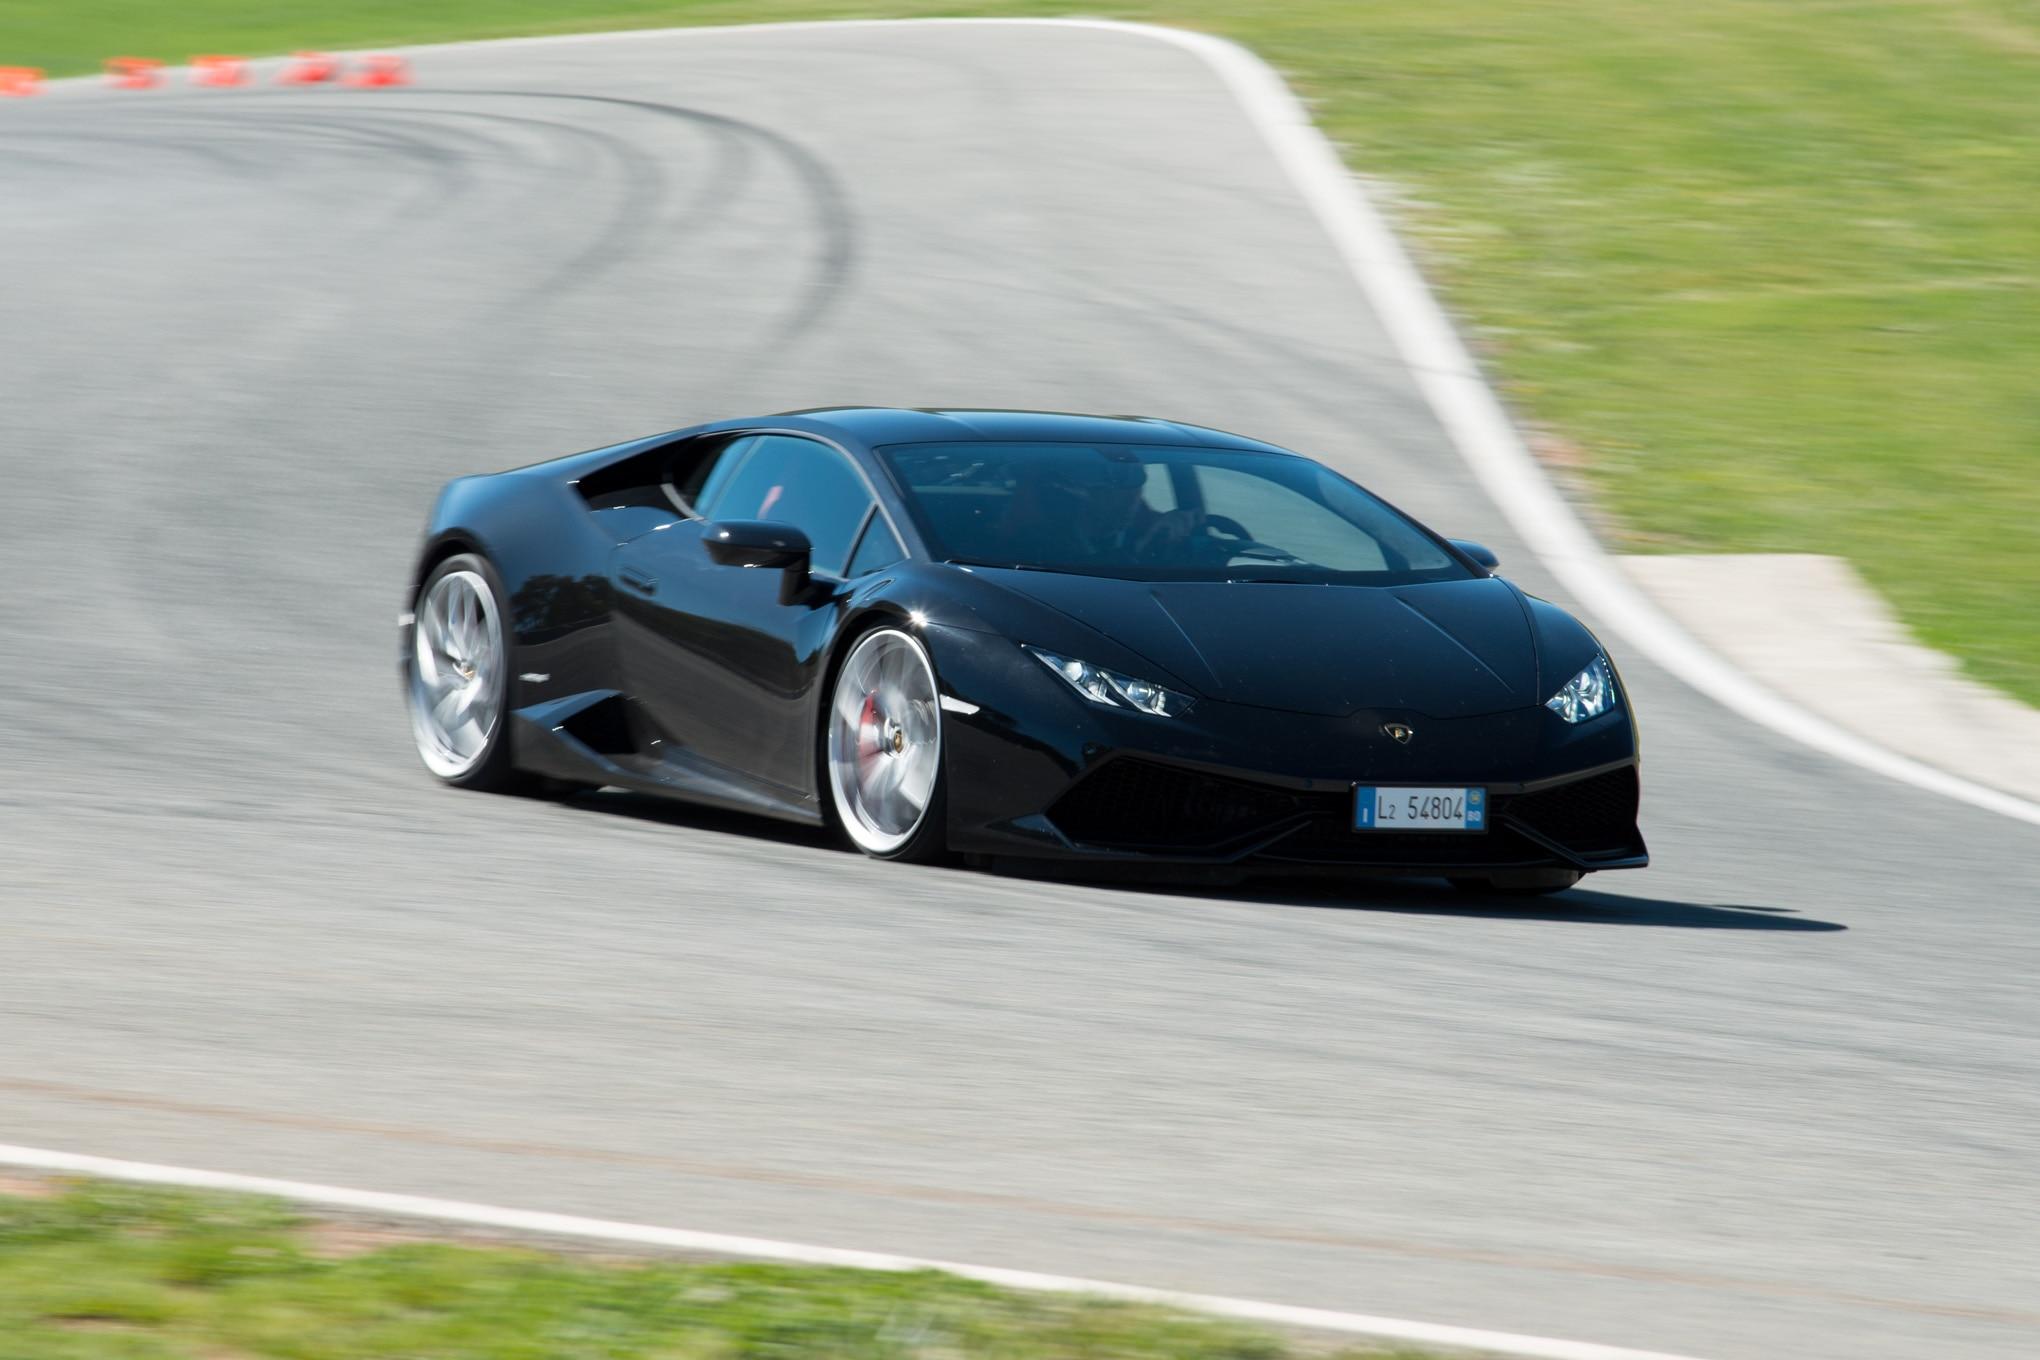 2015-Lamborghini-Huracan-LP-610-4-track-black-front-three-quarters Amazing 2015 Lamborghini Huracan Price Per Month Cars Trend